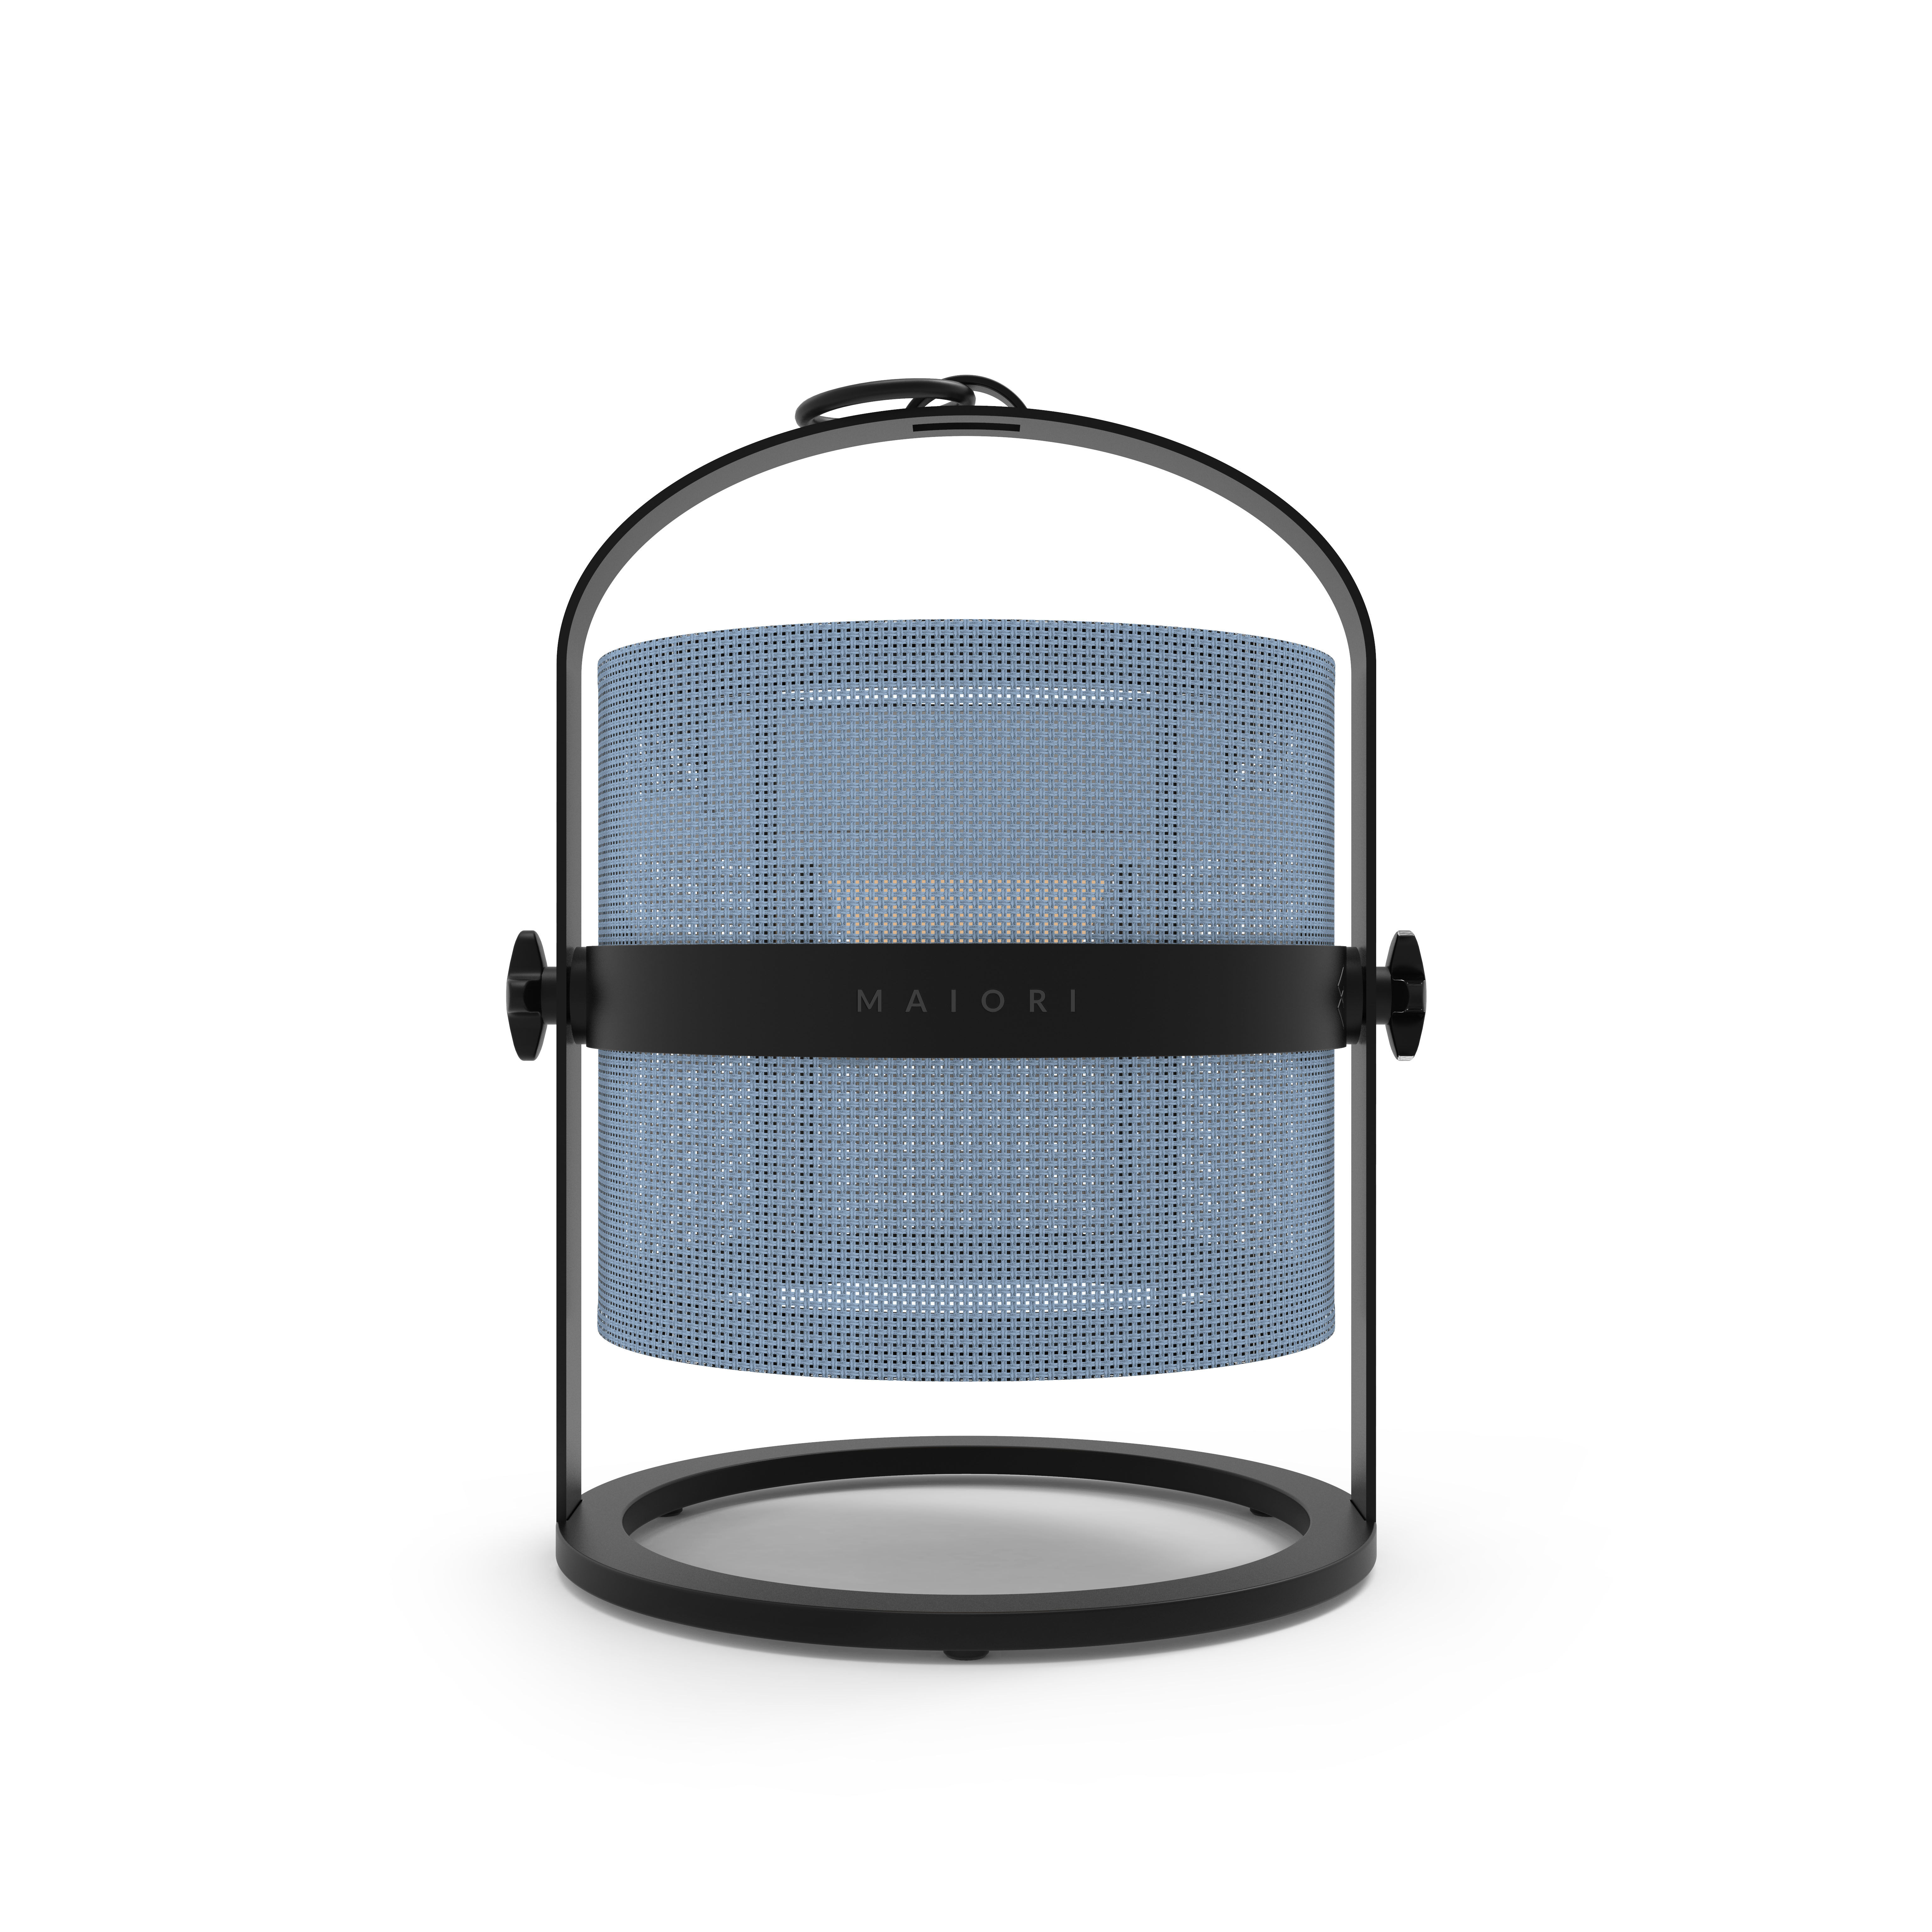 Lighting - Table Lamps - La Lampe Petite LED Solar lamp - Solar - Black structure by Maiori - Structure : Black - Diffuser : Royal Blue - Aluminium, Technical fabric